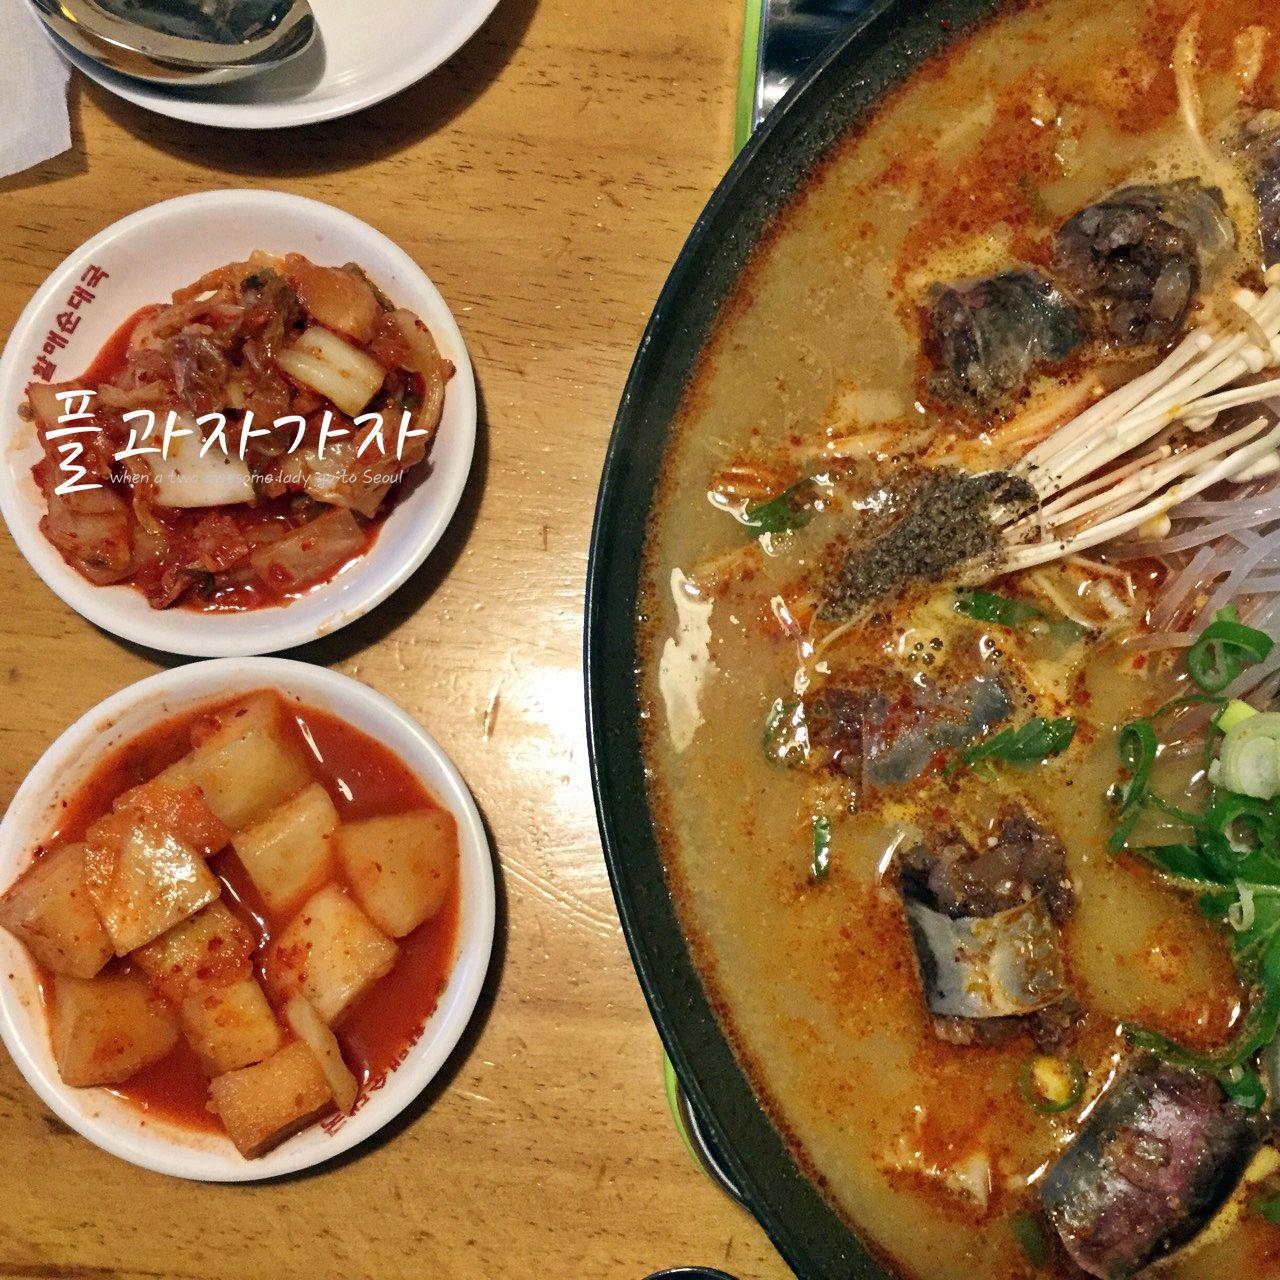 DAY1 [160610] 순대소곱창전골 #할매순대국   #플과자가자 made in seoul #whenatwoawesomeladygotoseoulPJ